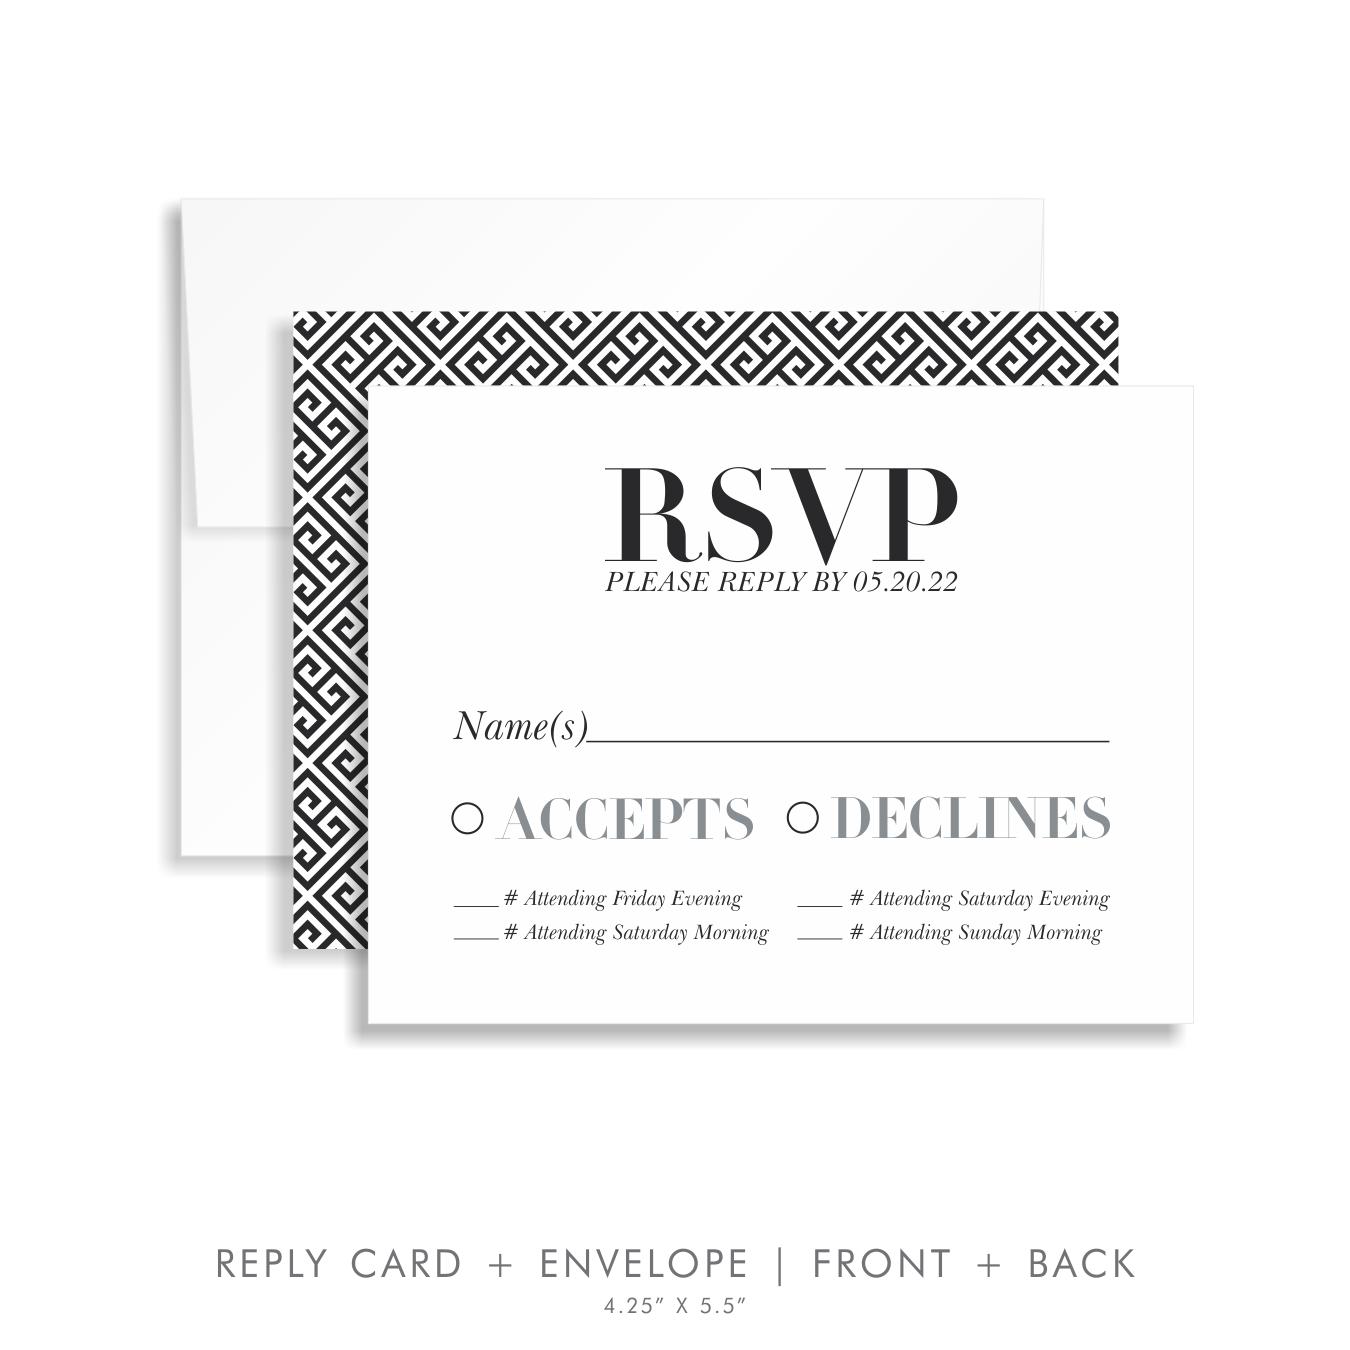 04 BAR MITZVAH INVITATION 5402-1 REPLY CARD.png